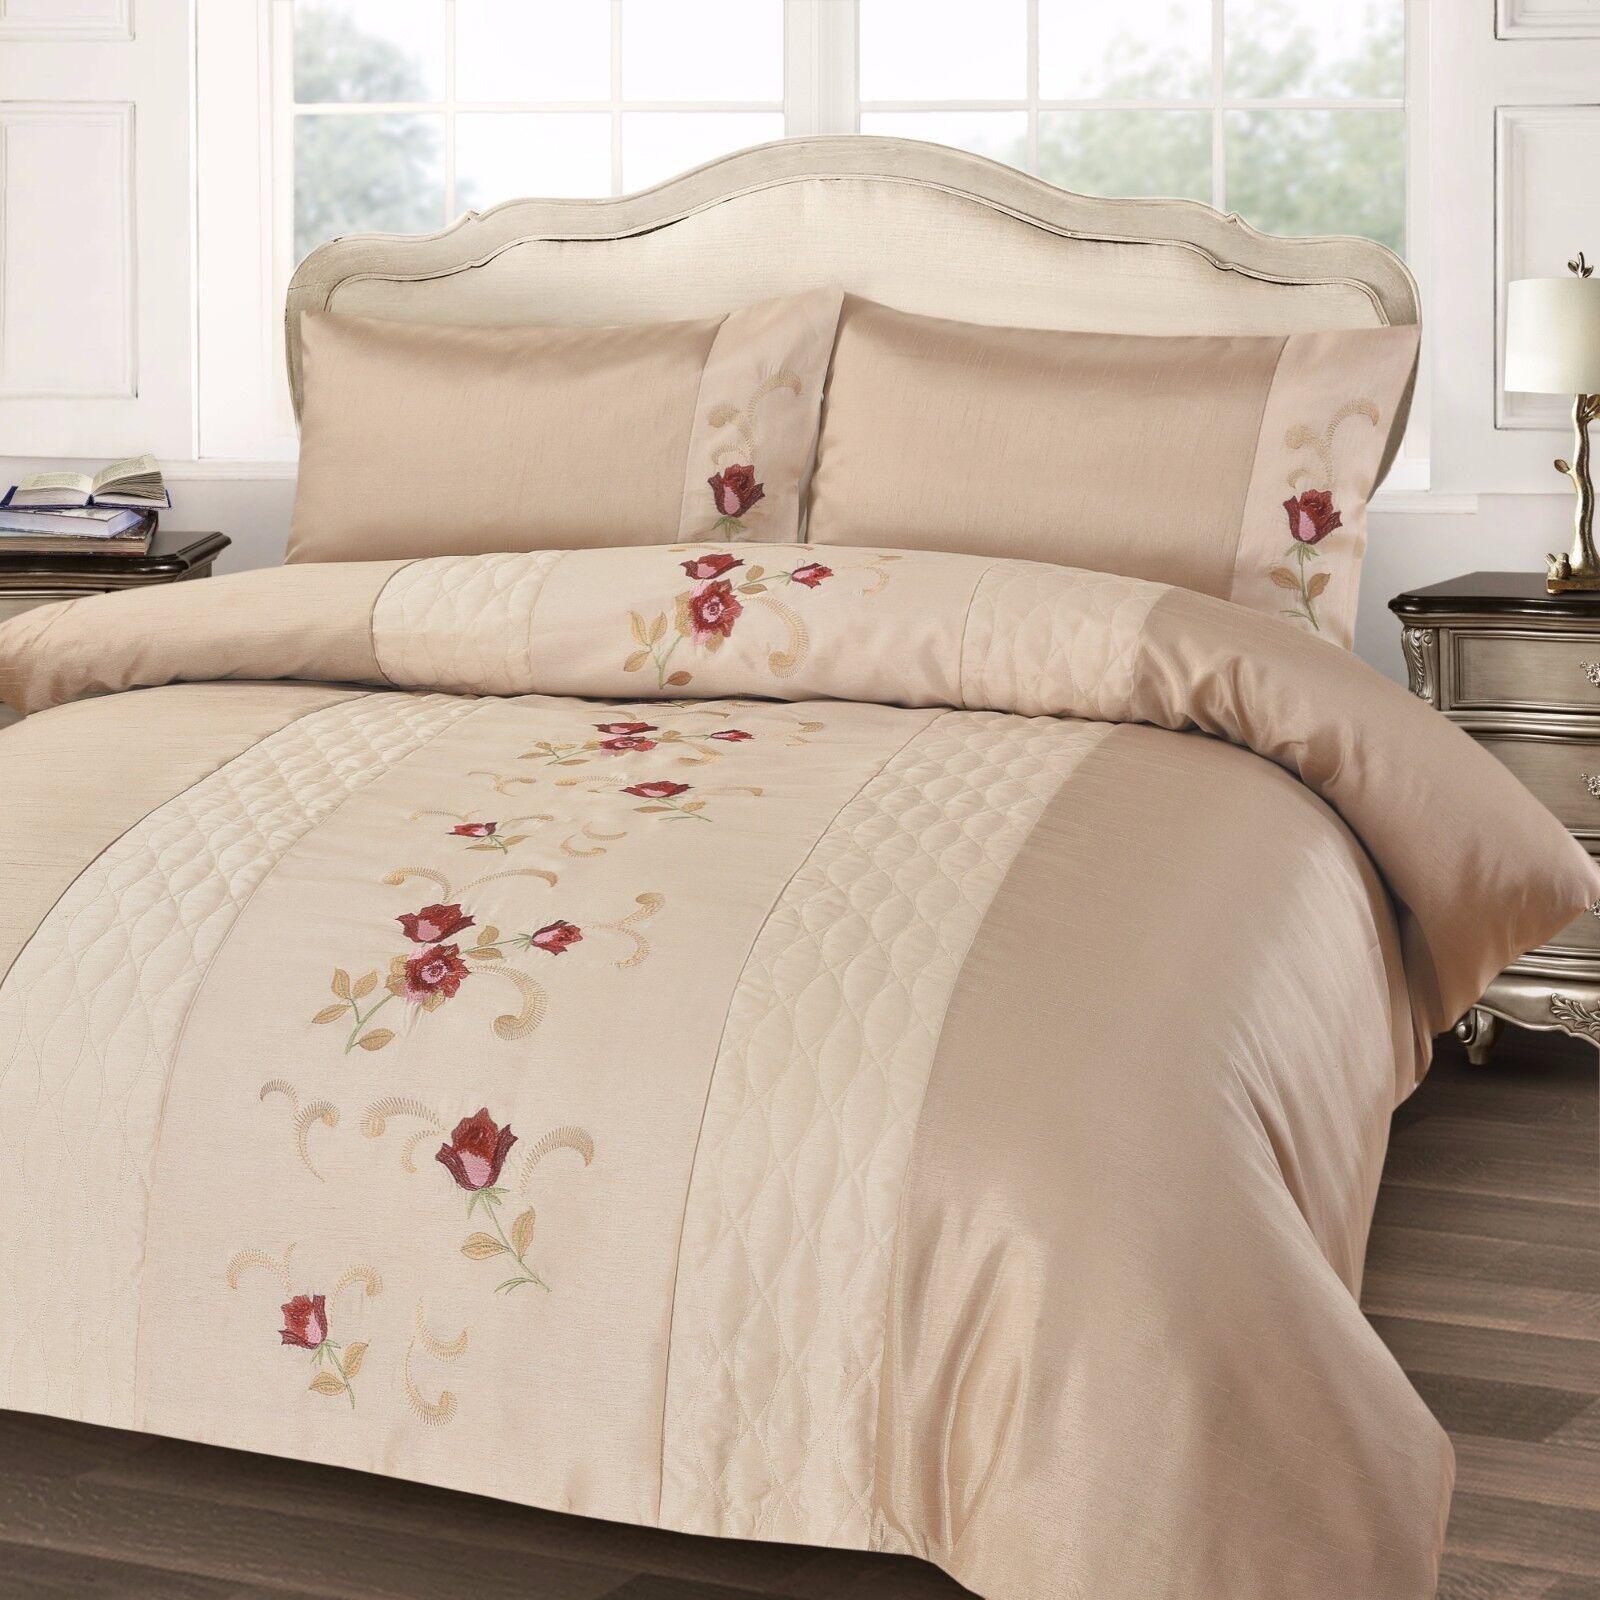 New Luxury Designer Soft Floral Duvet Quilt Cover Bedding Set Single Double King